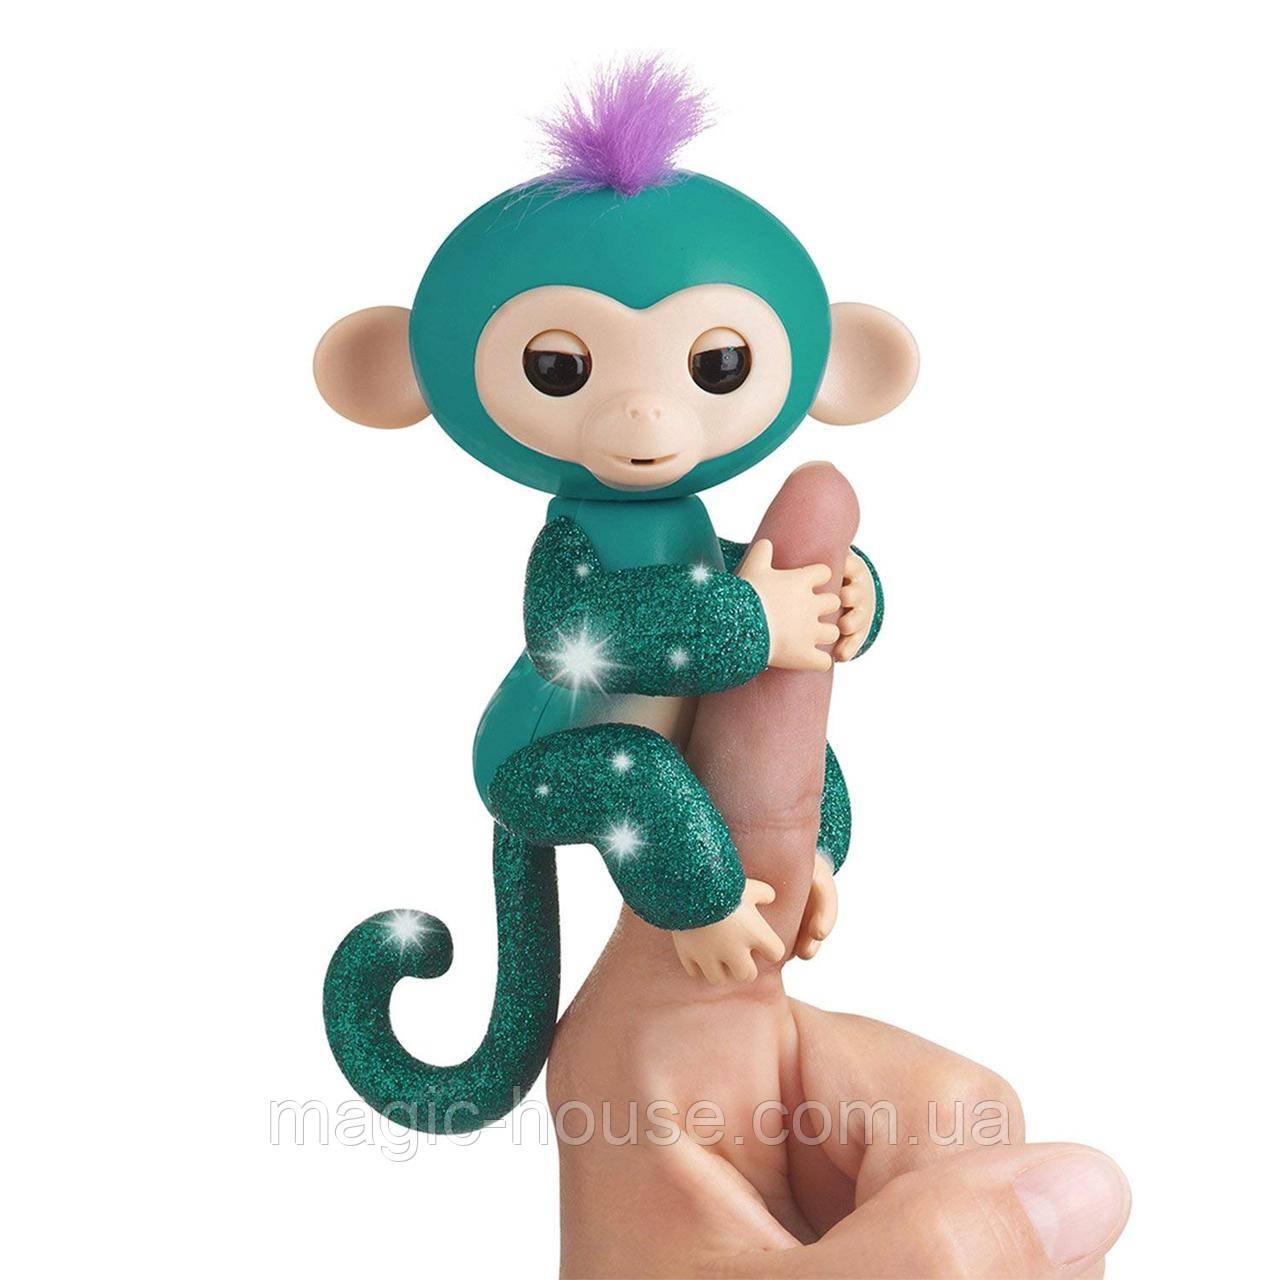 Интерактивная обезьянка Оригинал Фингерлинг Блестящая - Куинси WowWee Fingerlings